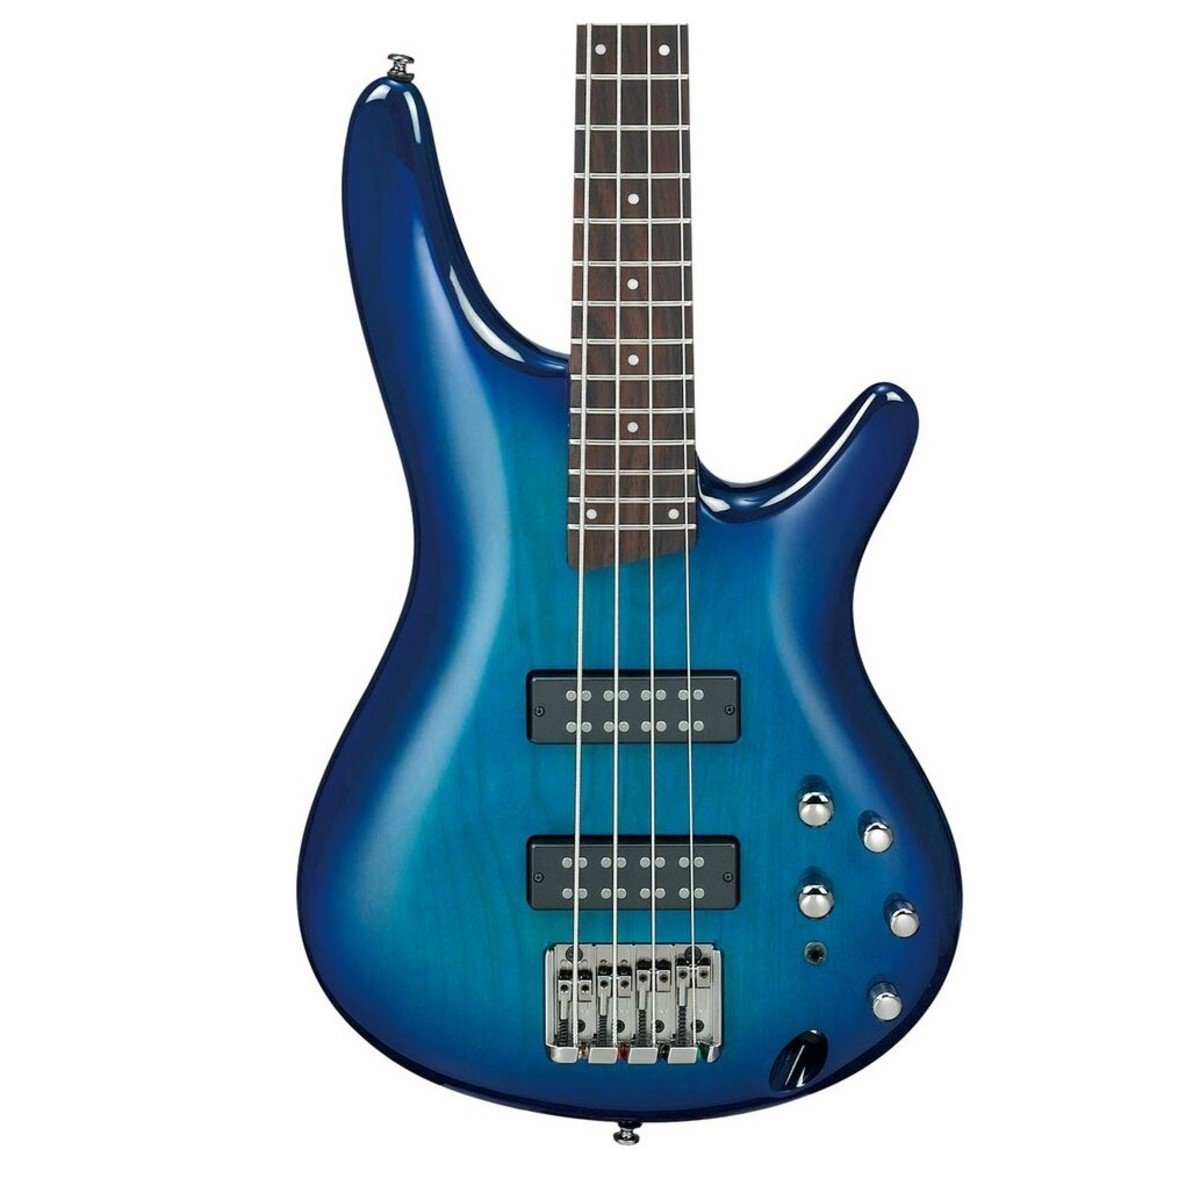 Ibanez SR370E - Sapphire Blue